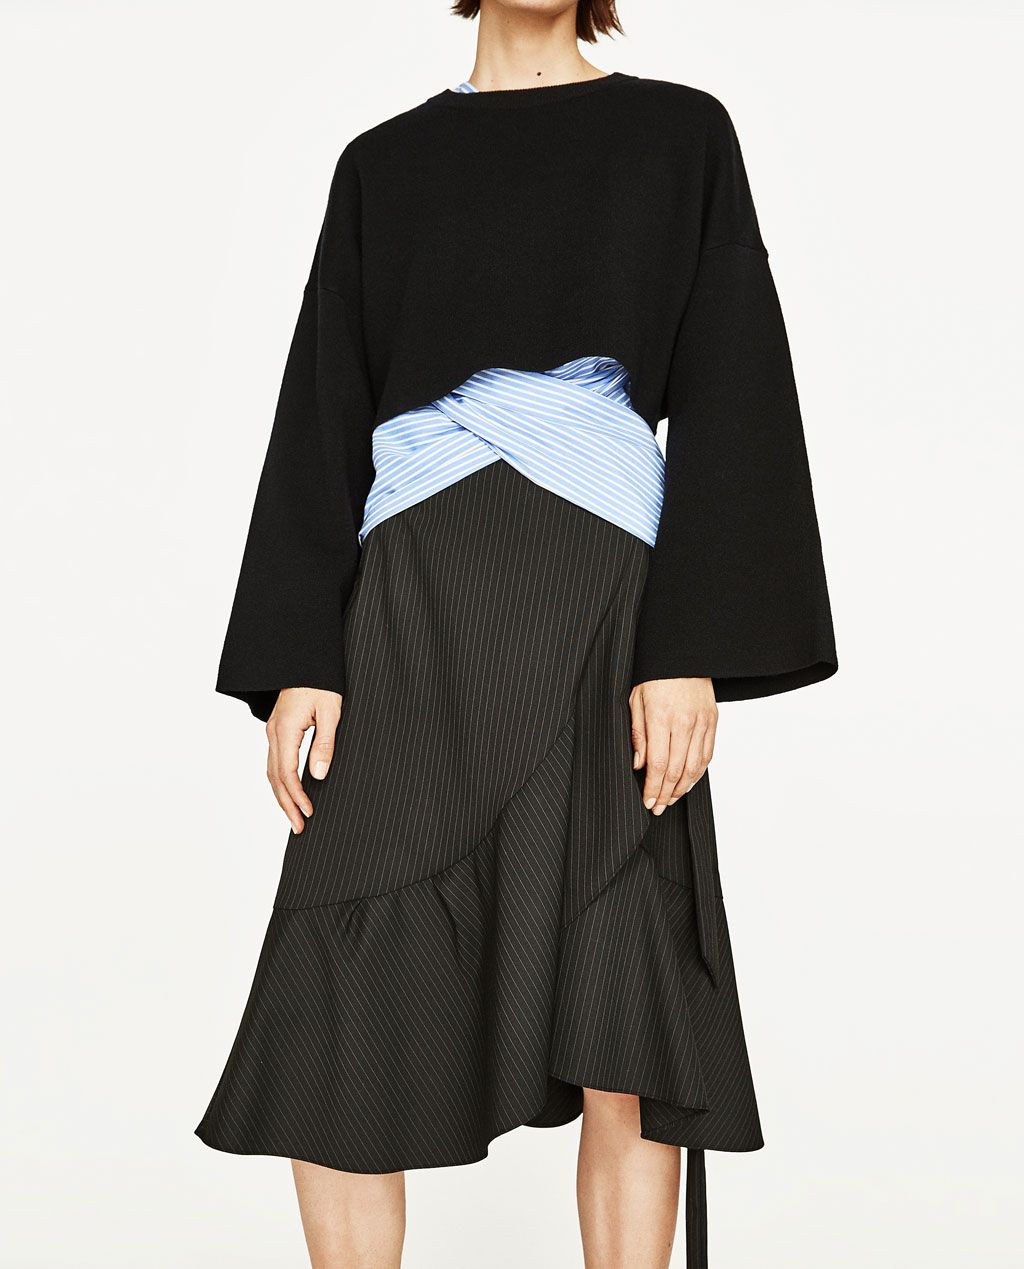 950ca5838e maje GALLIUM Metallic Leather Skirt at Maje US | Wearables | Leather Skirt,  Skirts, Metallic leather